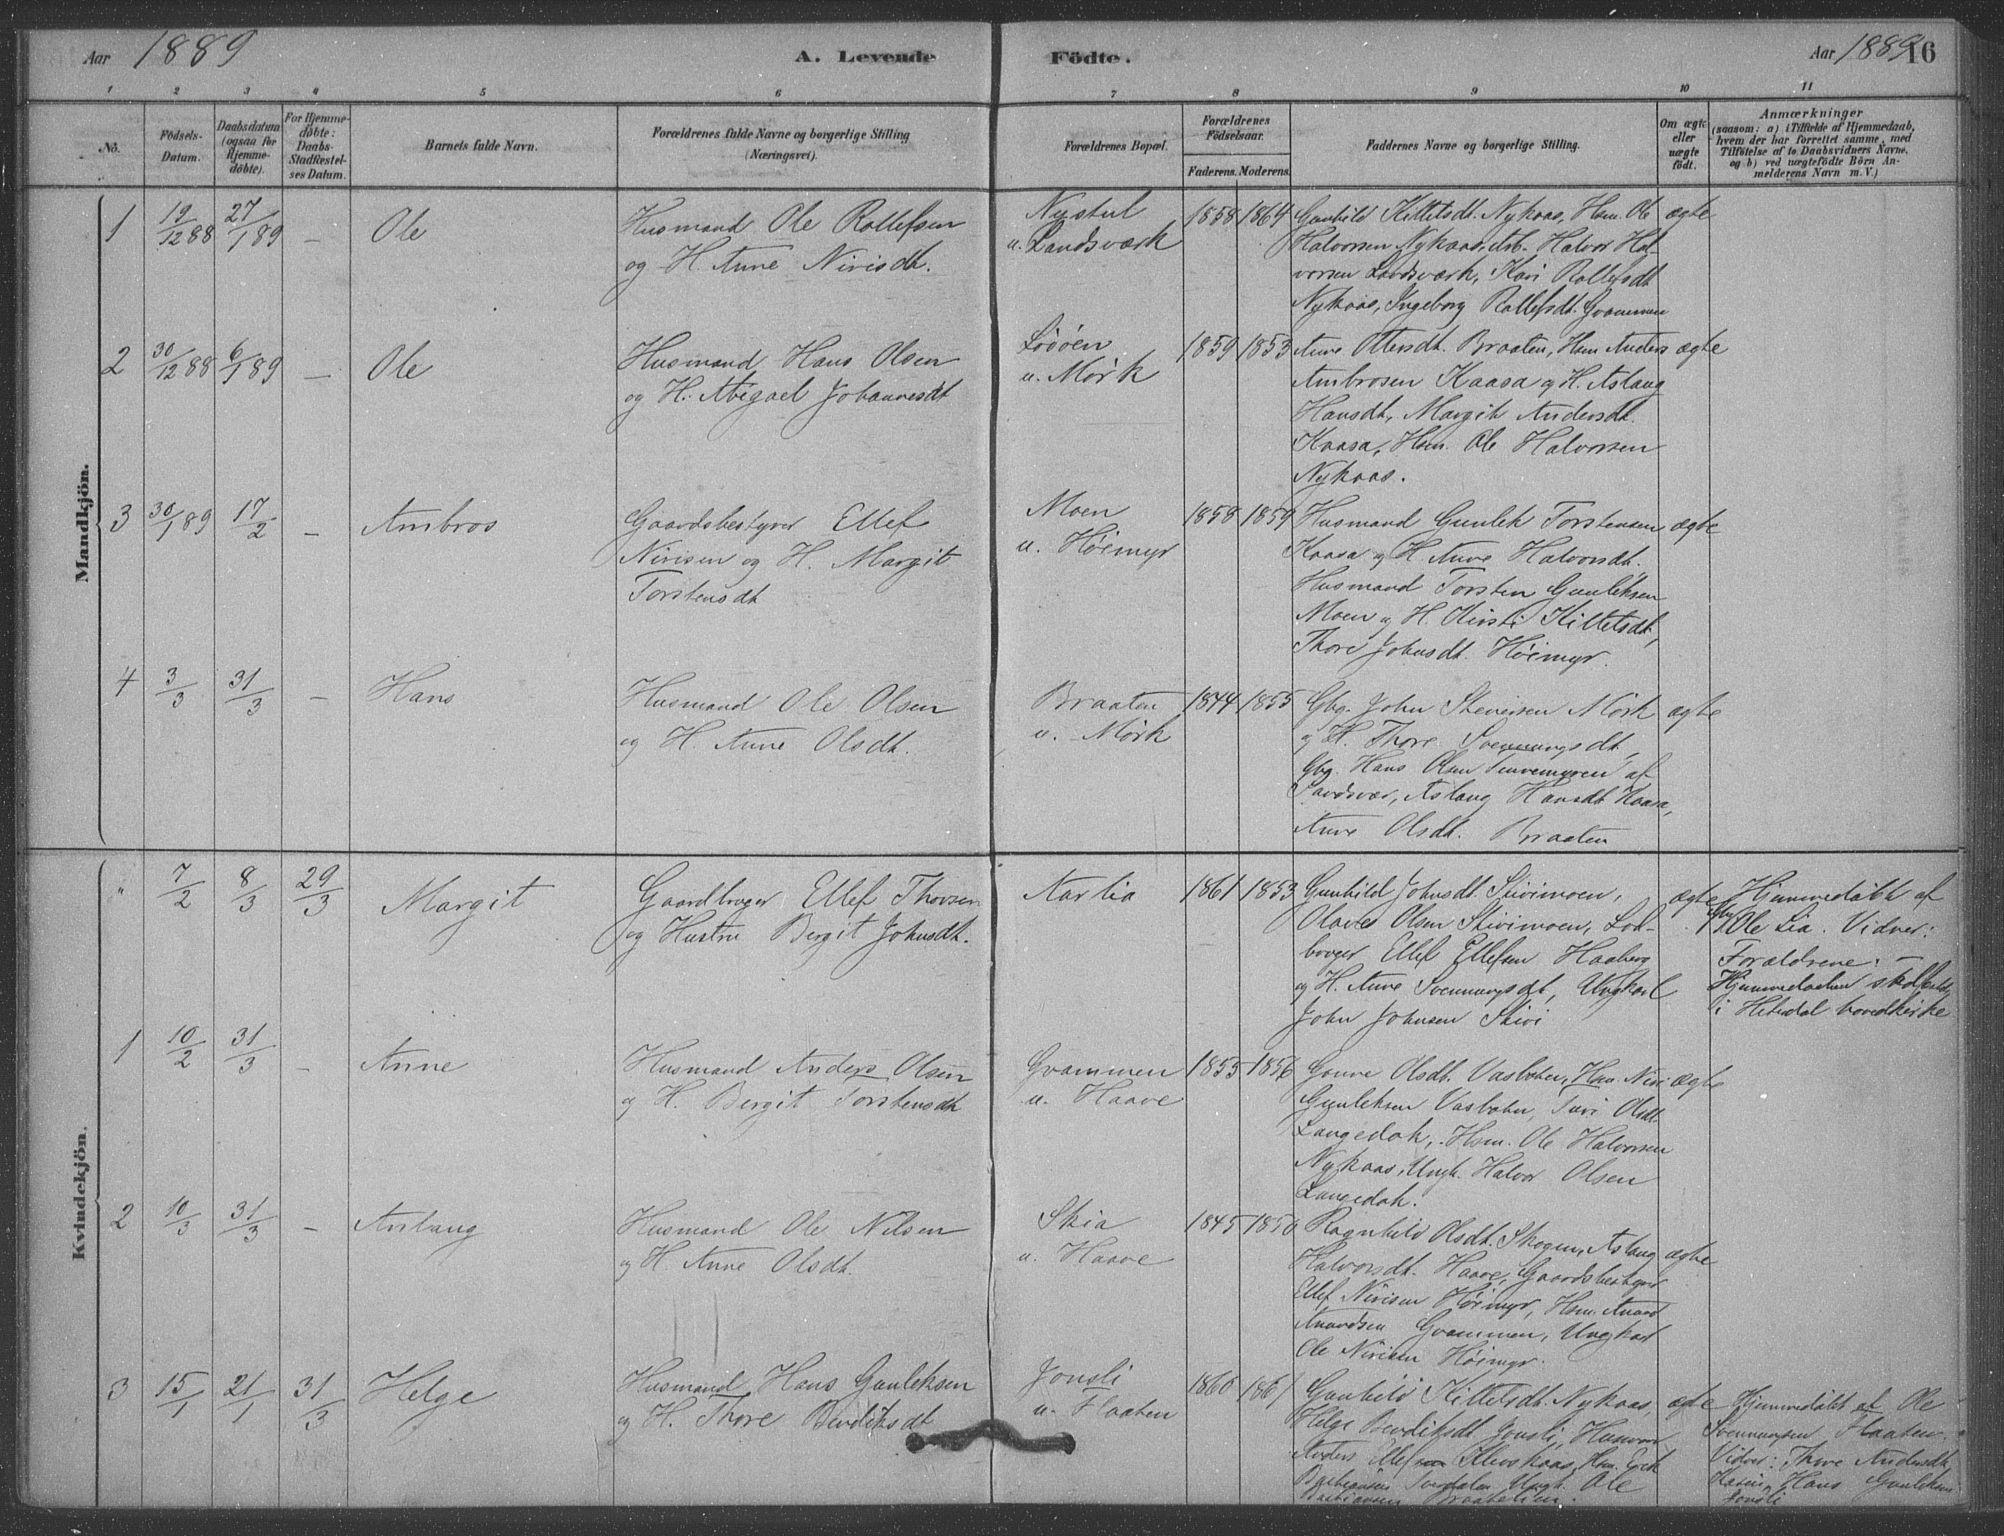 SAKO, Heddal kirkebøker, F/Fb/L0002: Ministerialbok nr. II 2, 1878-1913, s. 16